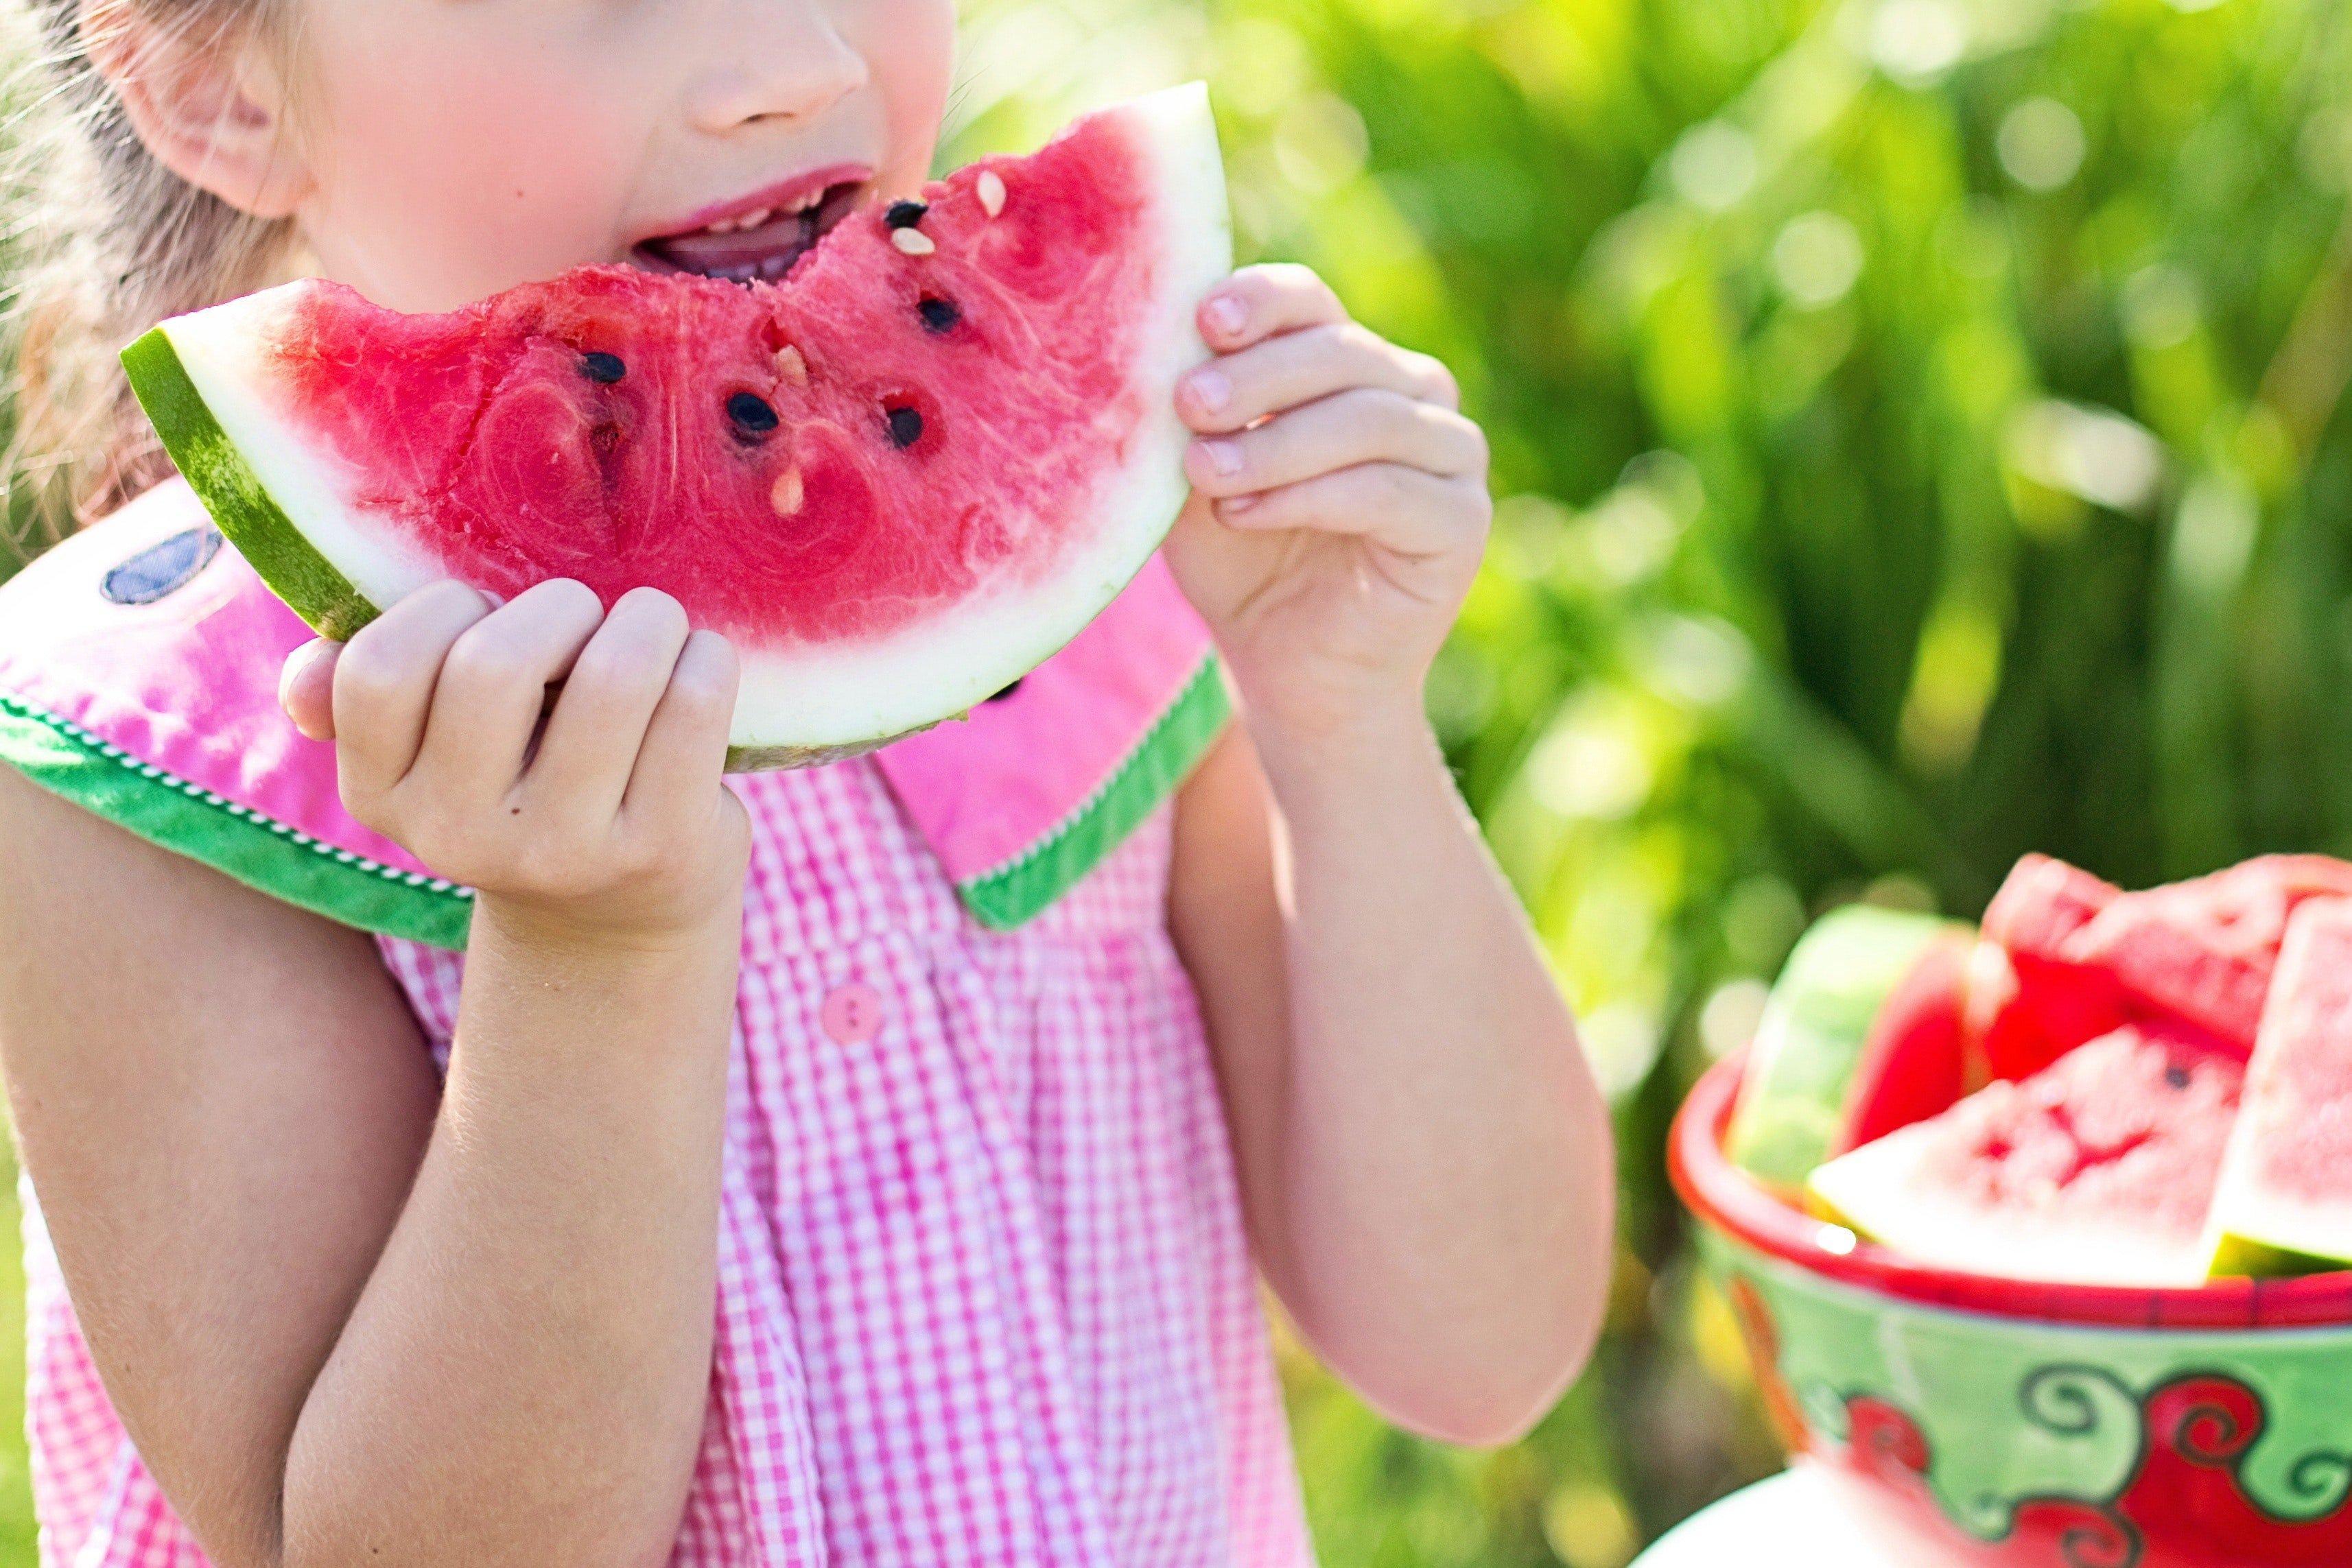 messy eating girl eating watermelon